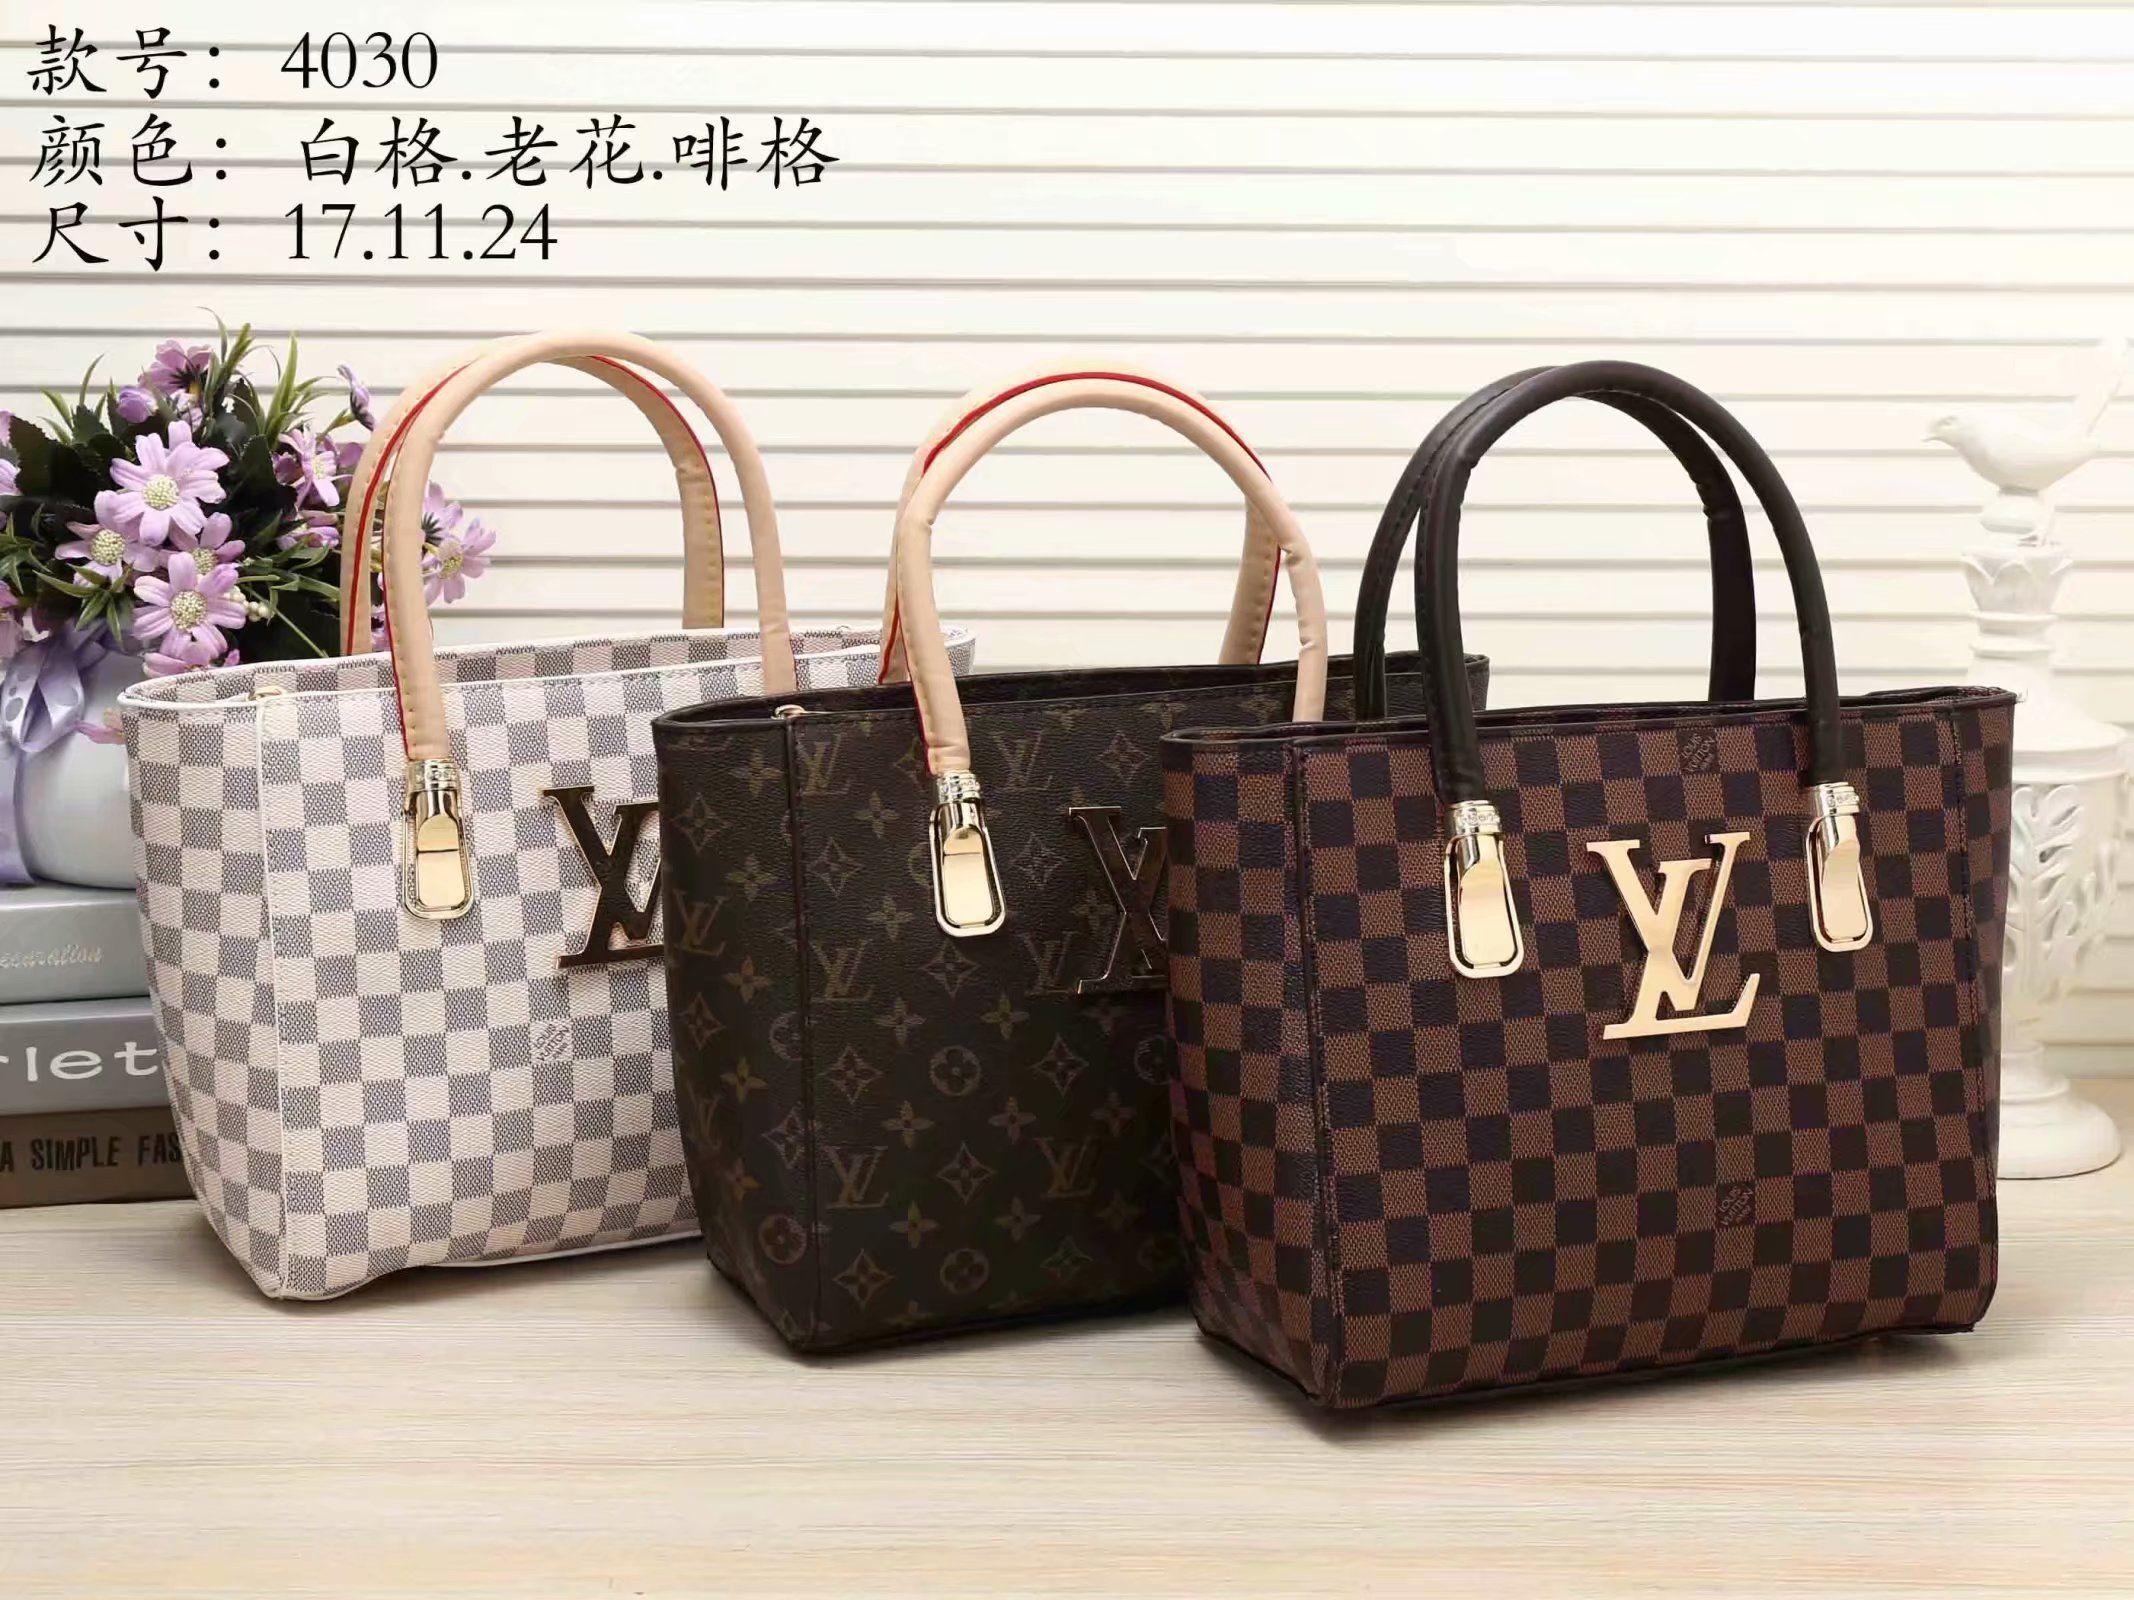 62aa6aab5f5c 2019 NEW Europe Luxury Brand Women Bag Famous Designers Handbags Canvas  Backpack Women S School Bag Backpack Styl Backpacks Brands  G9965 Bookbags  Backpack ...